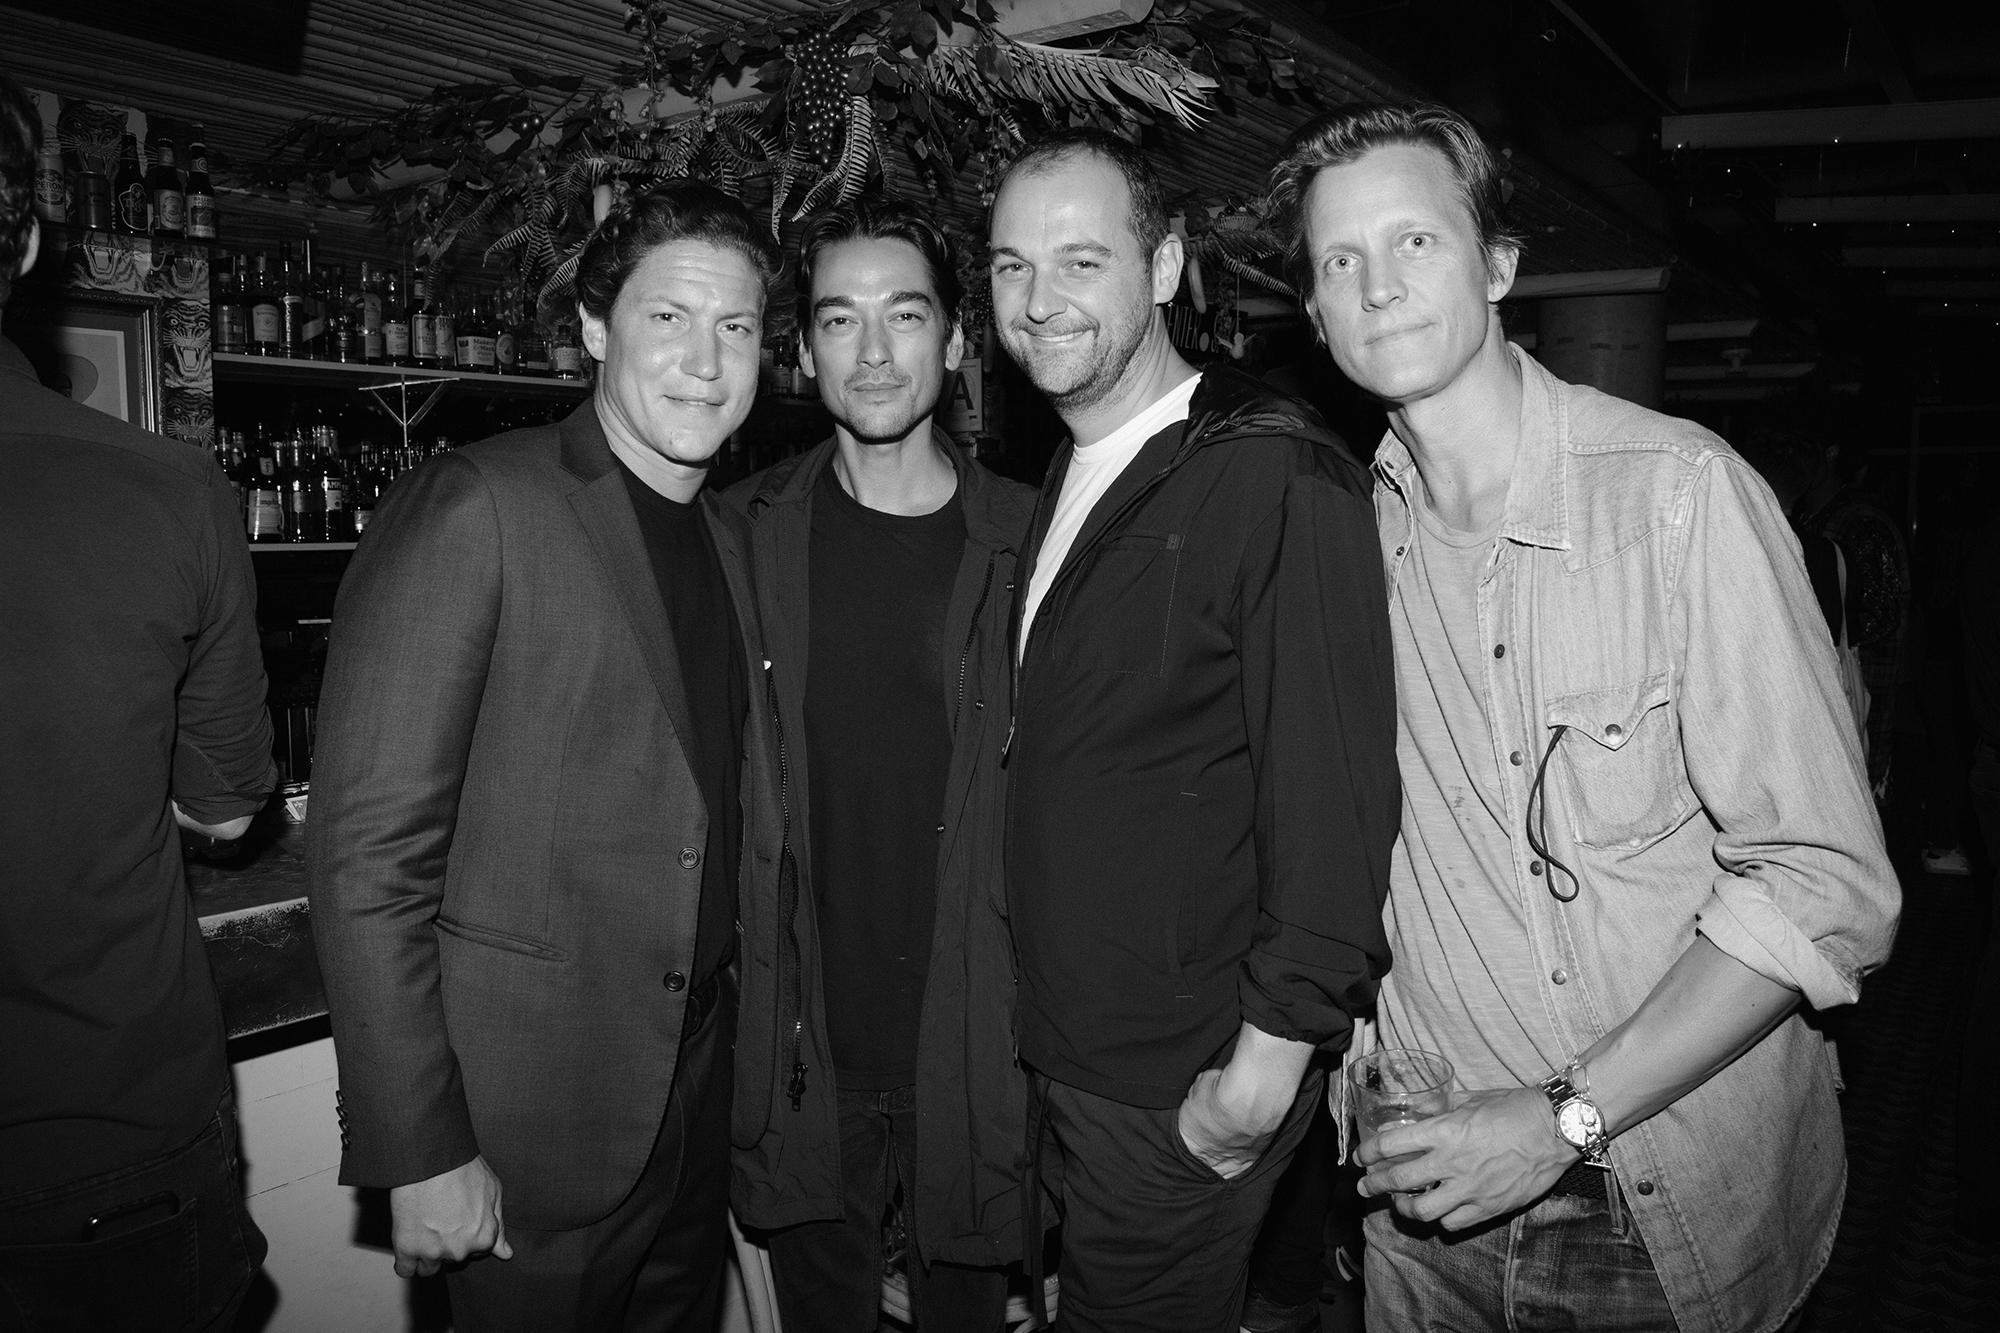 Vito Schnabel, Tenzin Wild, Daniel Humm, and Magnus Berger